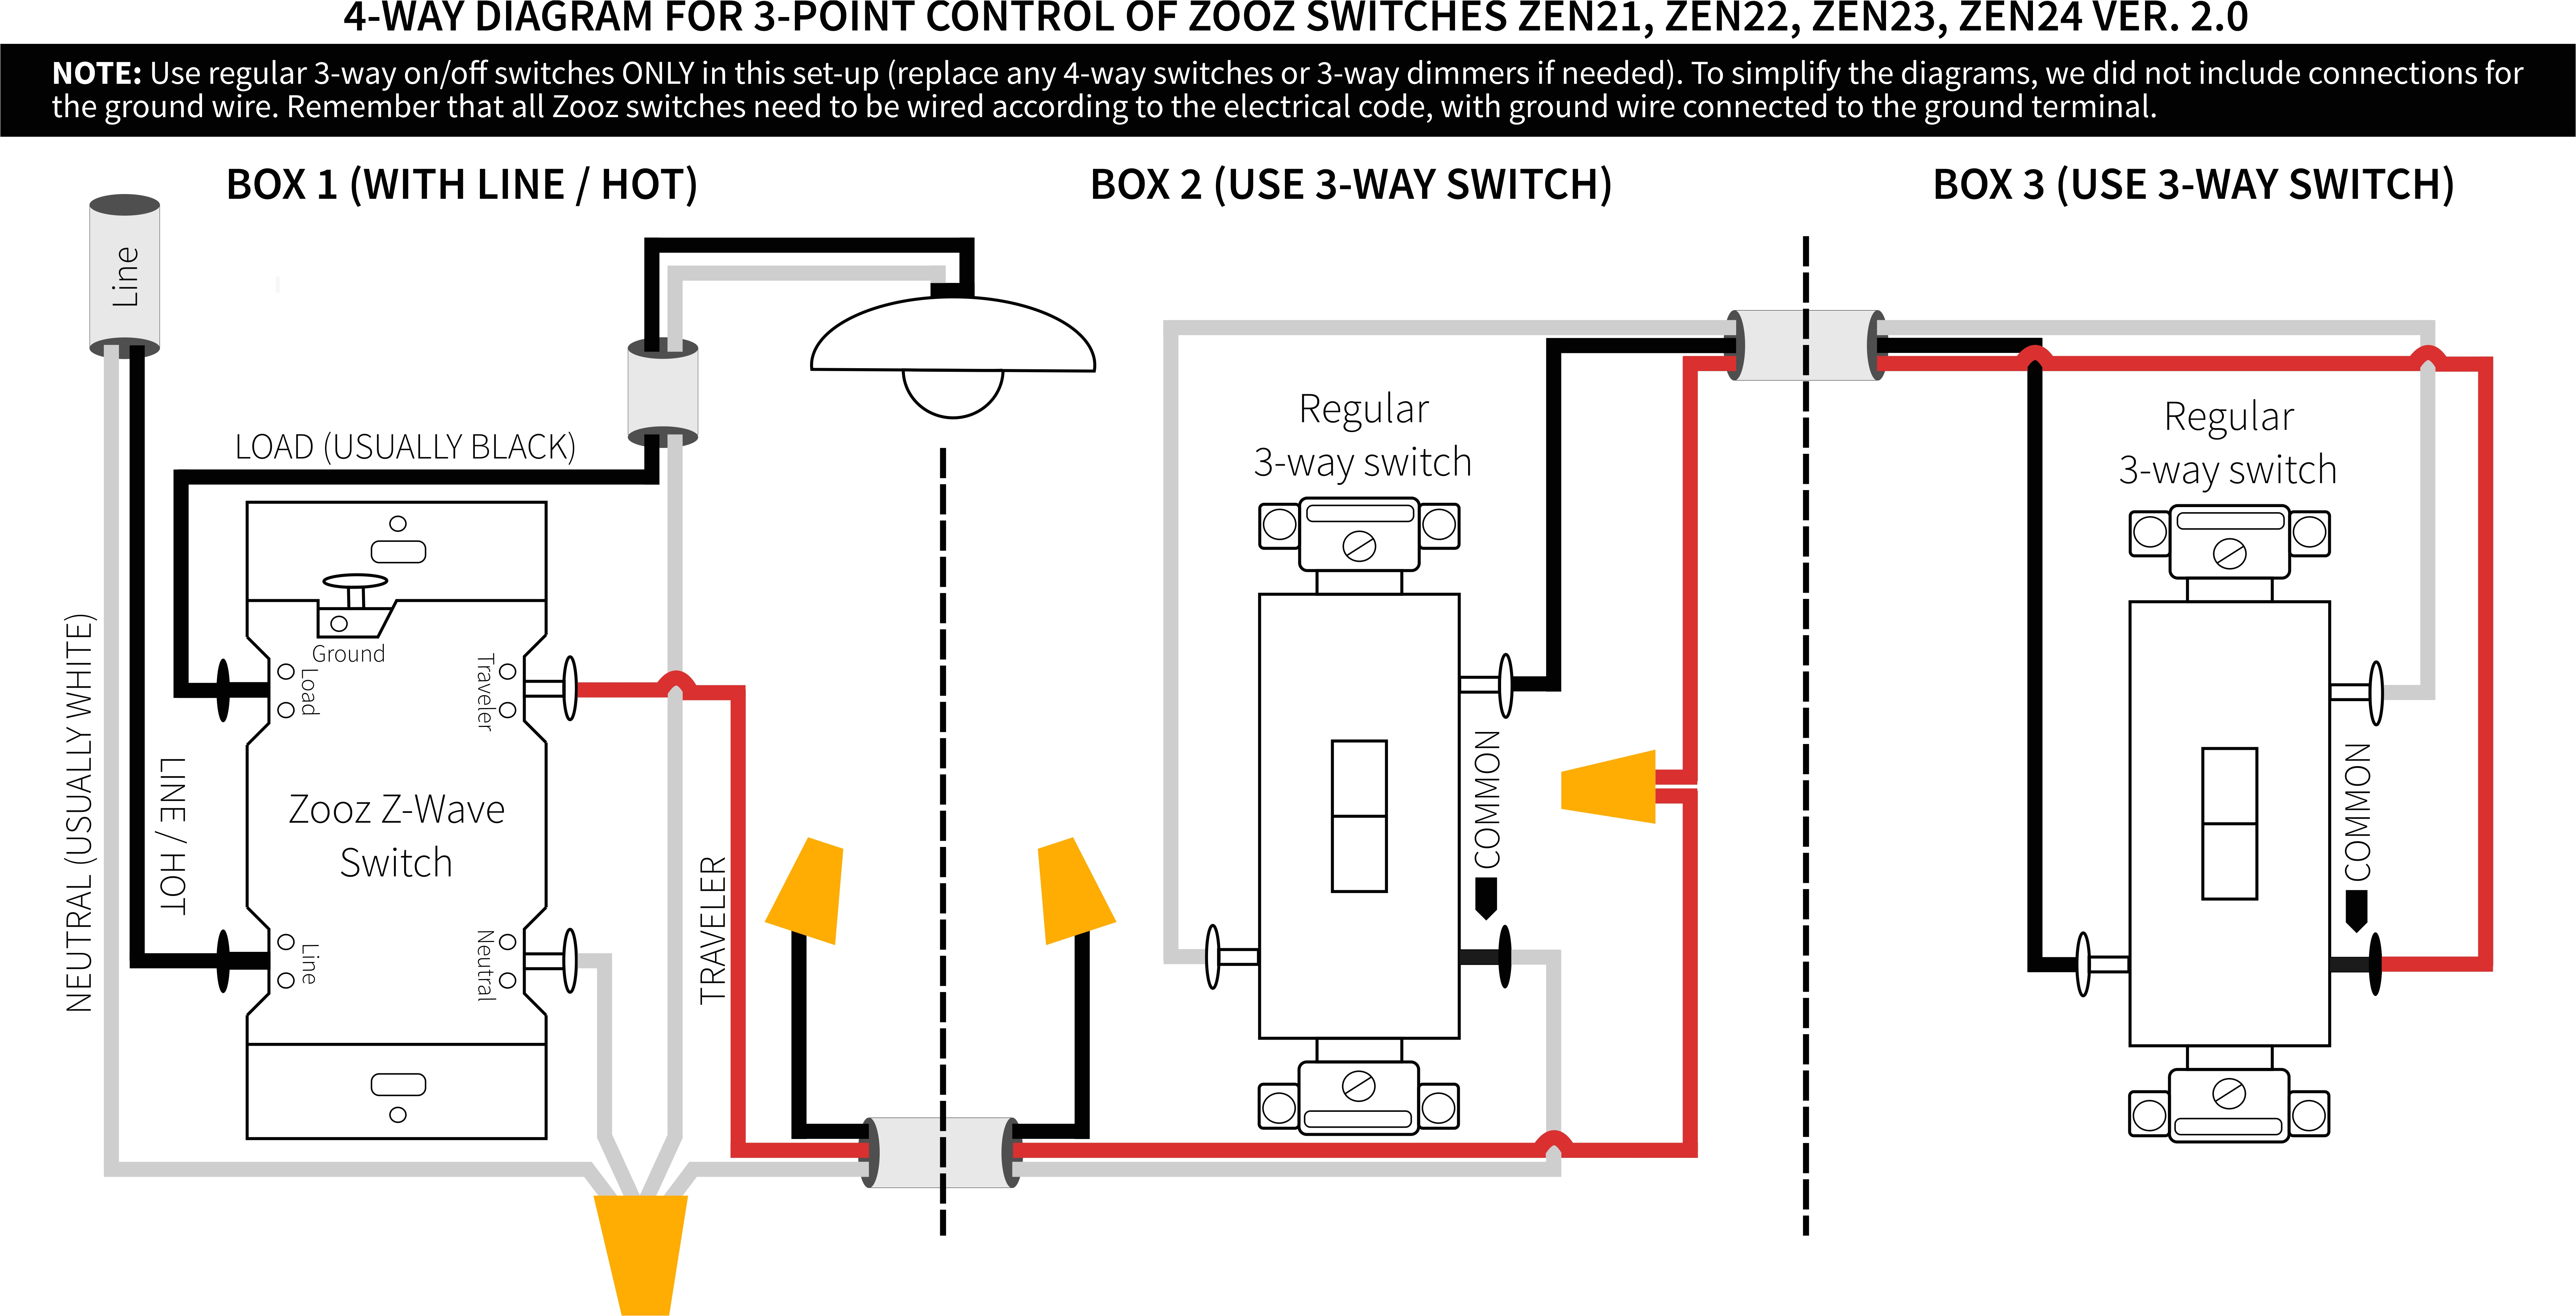 Lutron Diva 3 Way Dimmer Wiring Diagram Lutron 4 Way Dimmer Wiring Diagram Wiring Diagram Etc